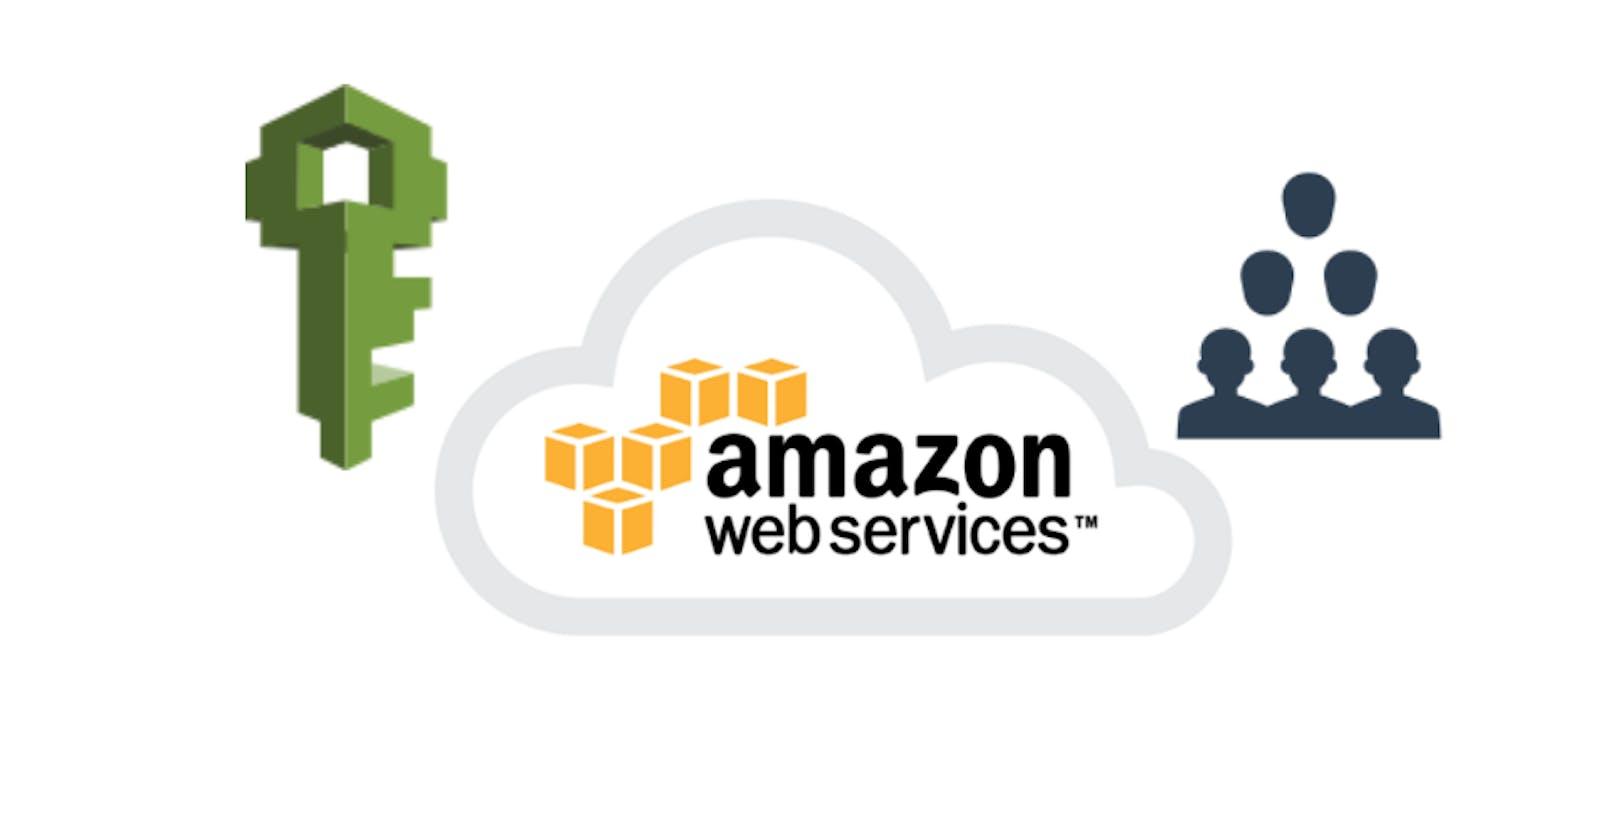 Create AWS IAM User with Programmatic Access